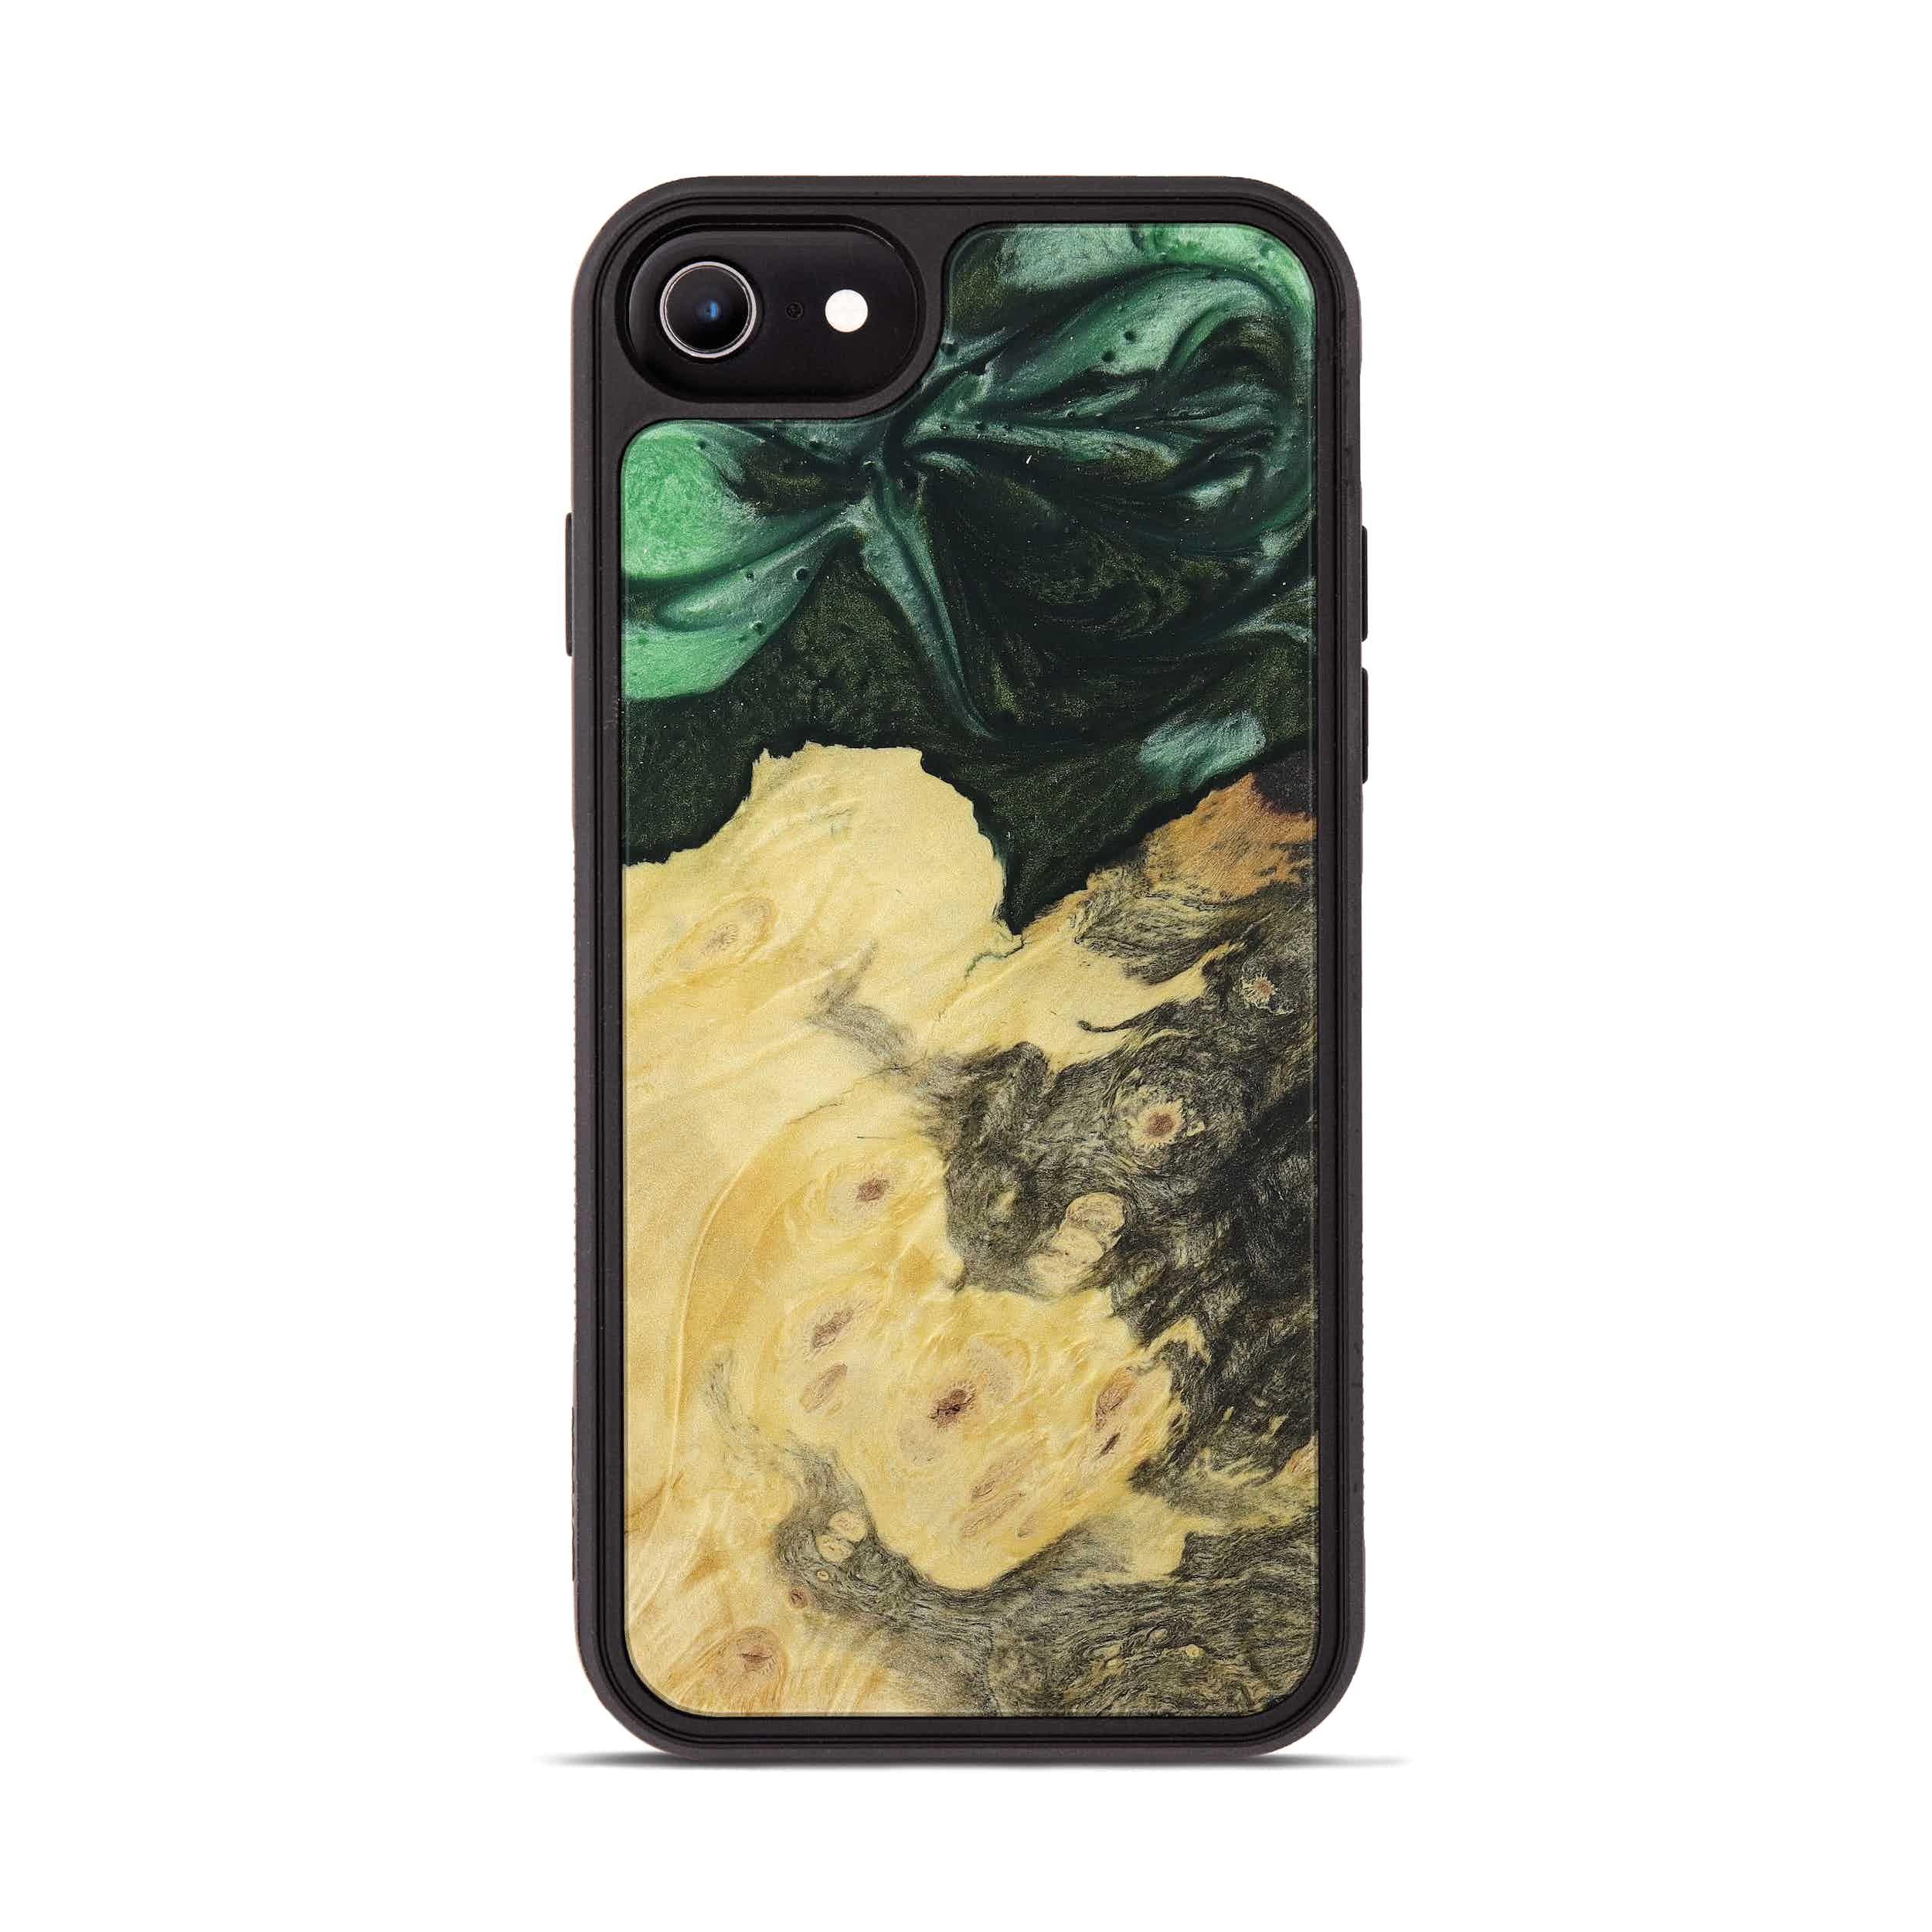 iPhone 6s Wood+Resin Phone Case - Pammi (Dark Green, 394616)